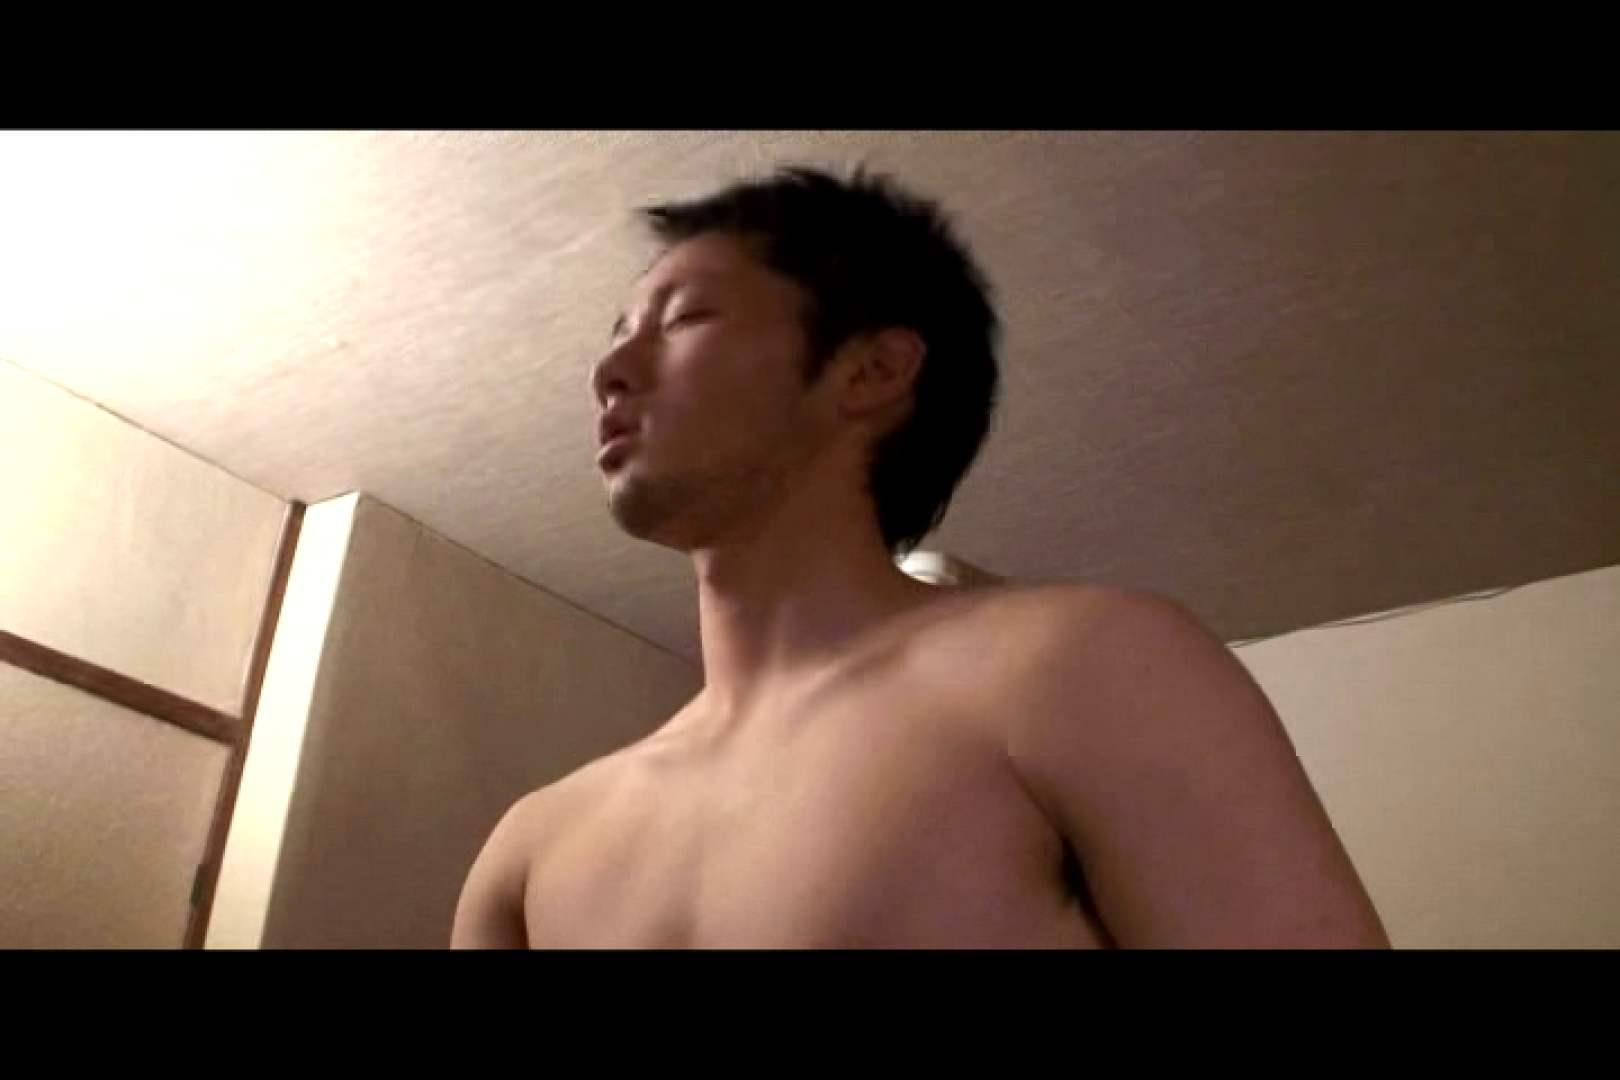 Bistro「イケメン」~Mokkori和風仕立て~vol.01 プレイ動画 ゲイセックス画像 111pic 98